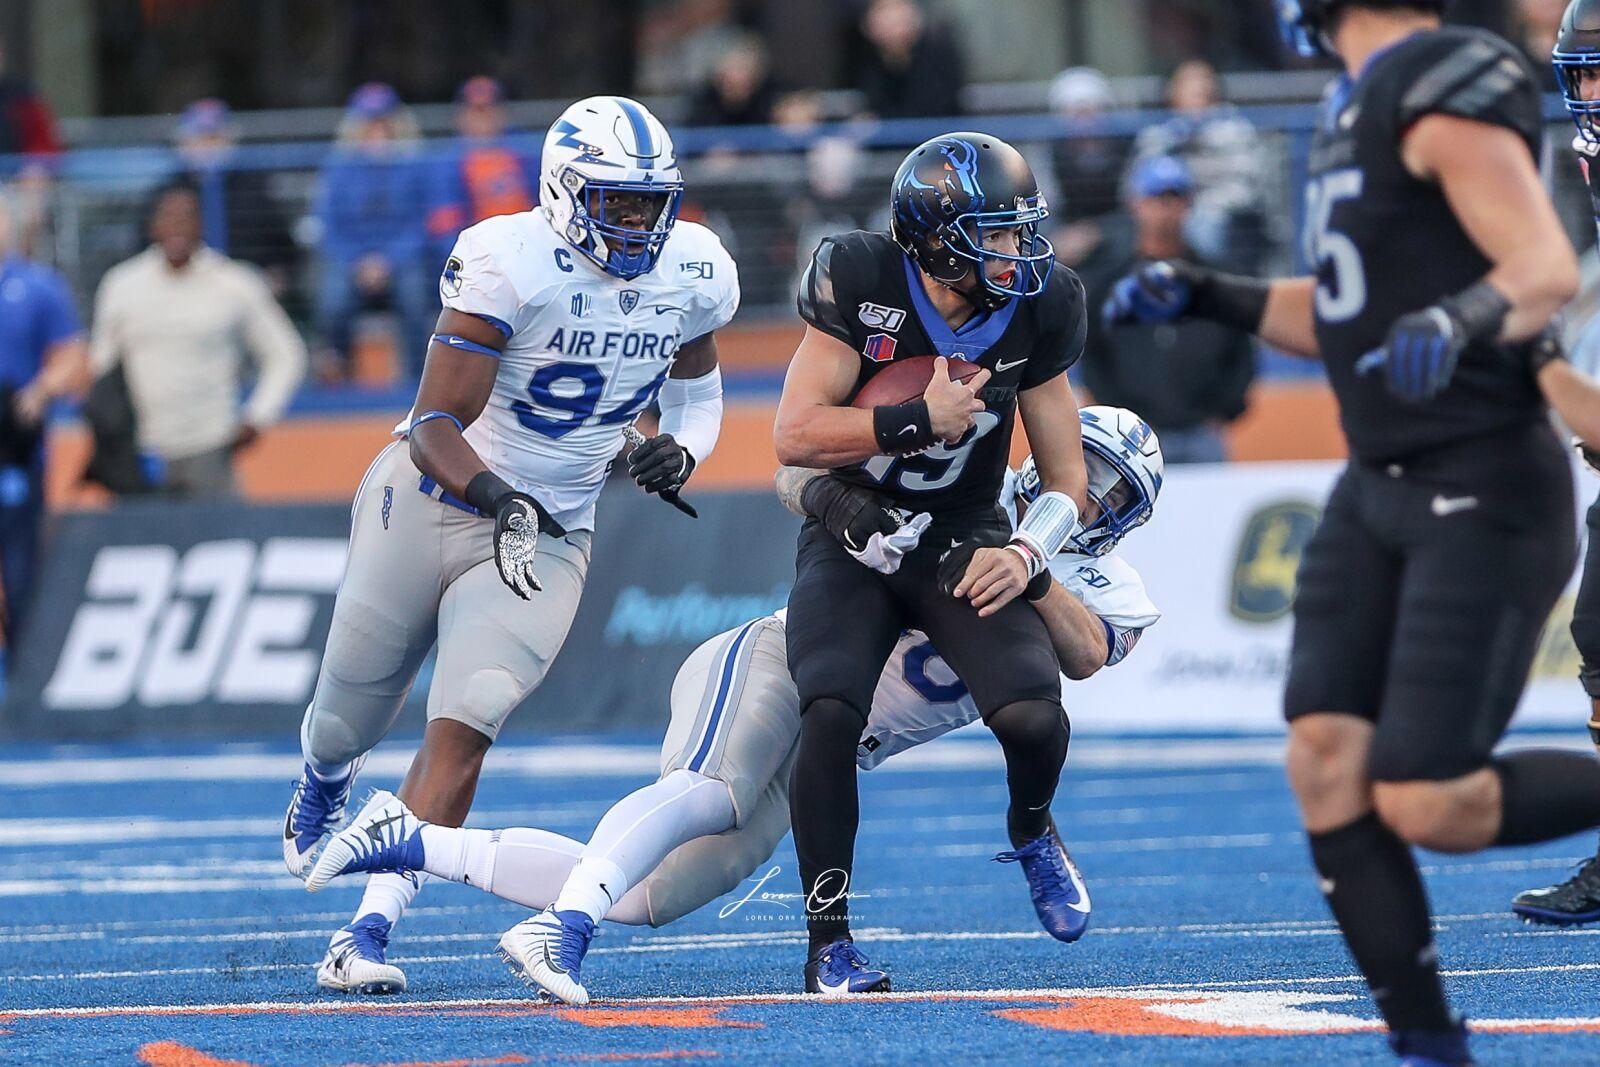 Boise State Football: Hank Bachmeier plays hero again vs. Air Force